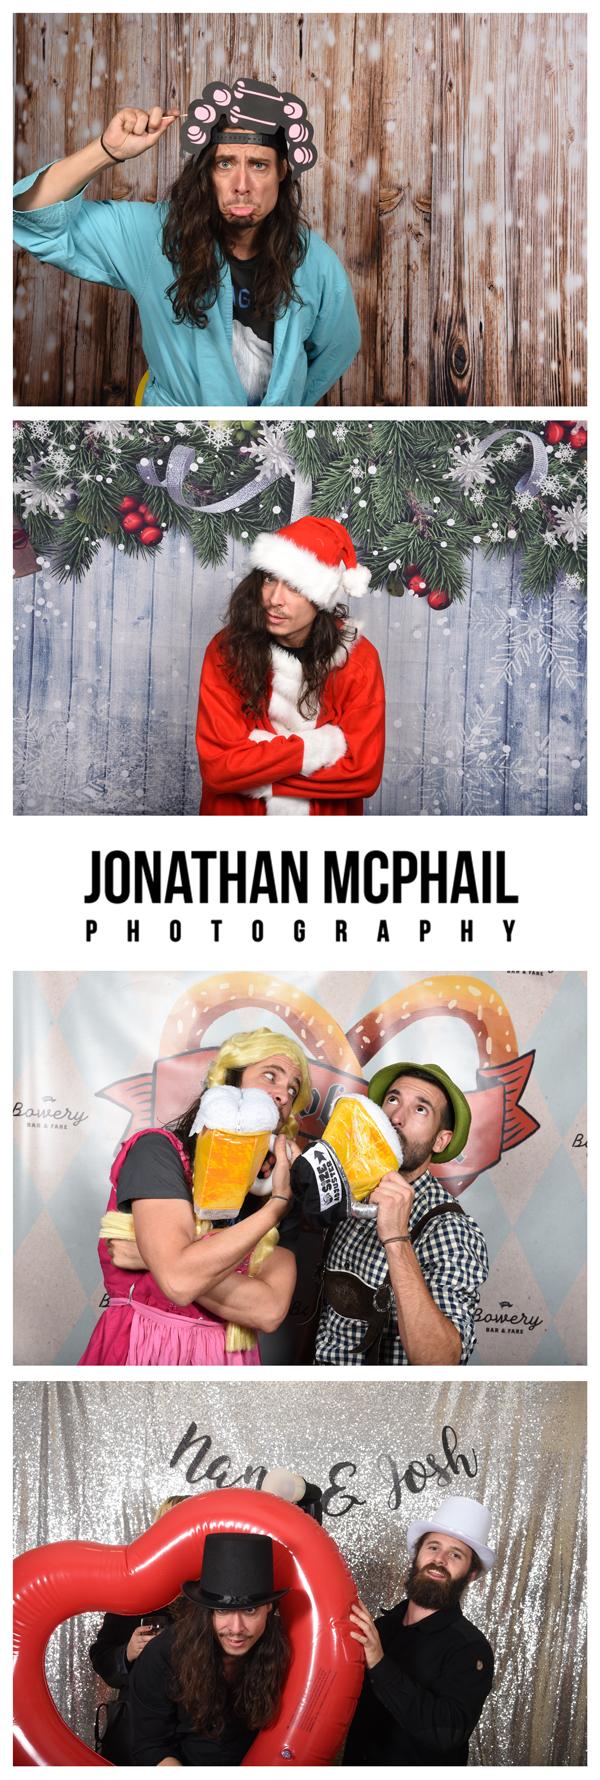 jonathan-mcphail-photography-photobooth-me-2.jpg